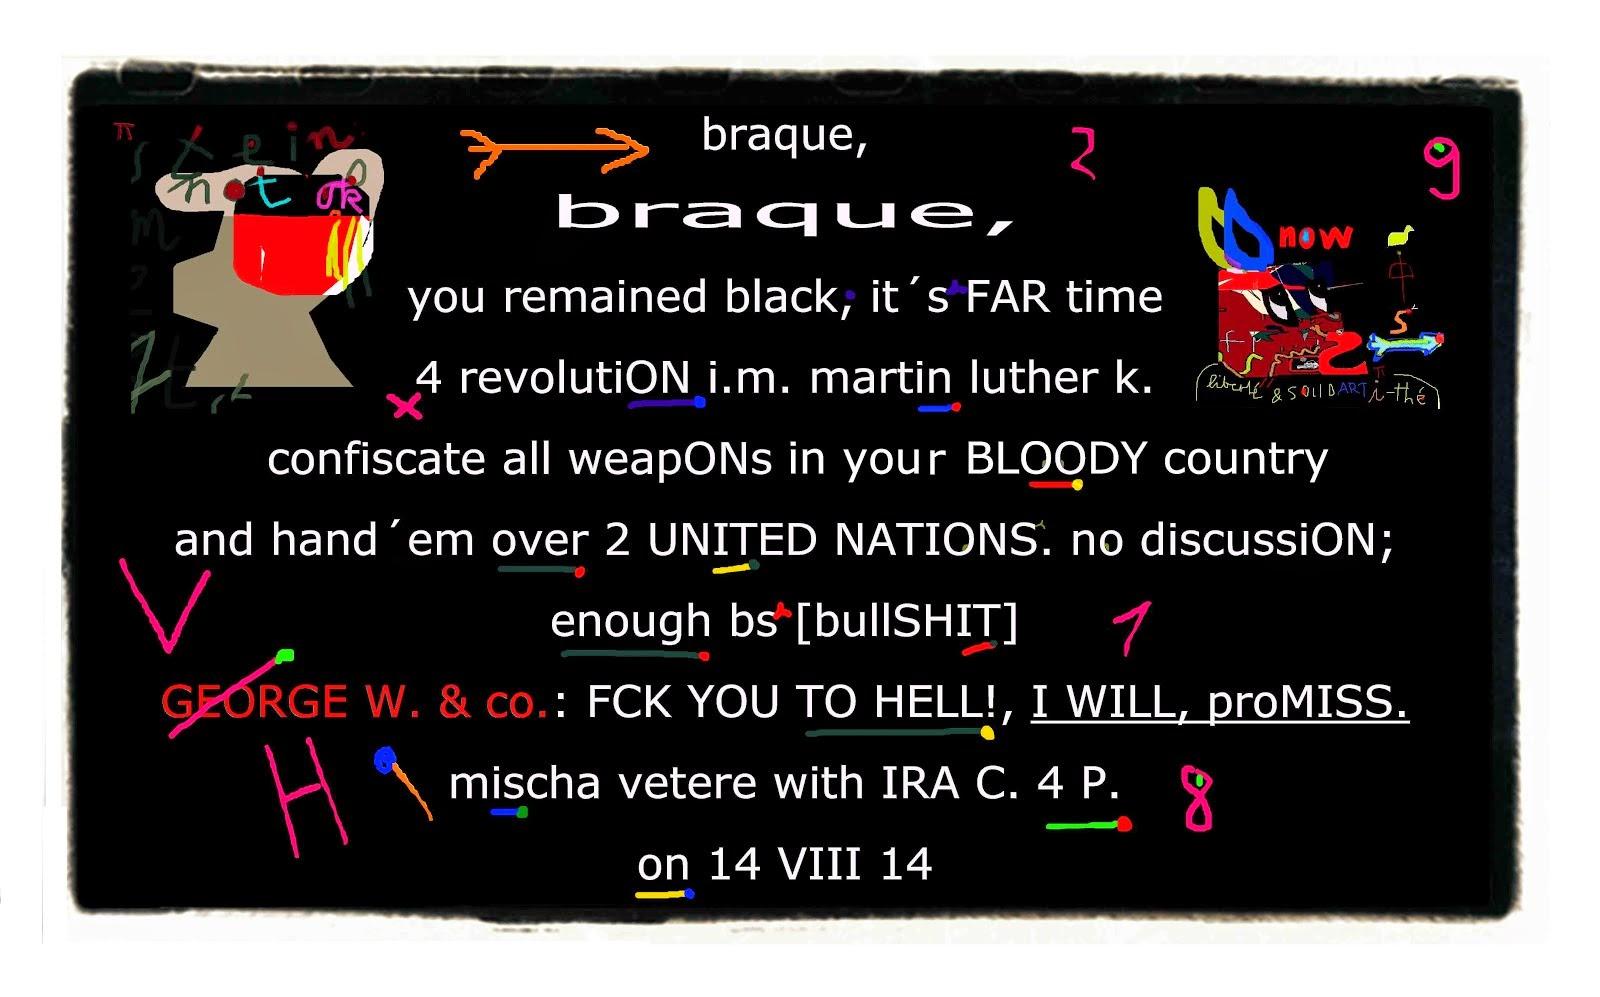 barack obama THE MENTAL REVOLUTION jimmy carter mischa vetere victor HUGO black war fergusON